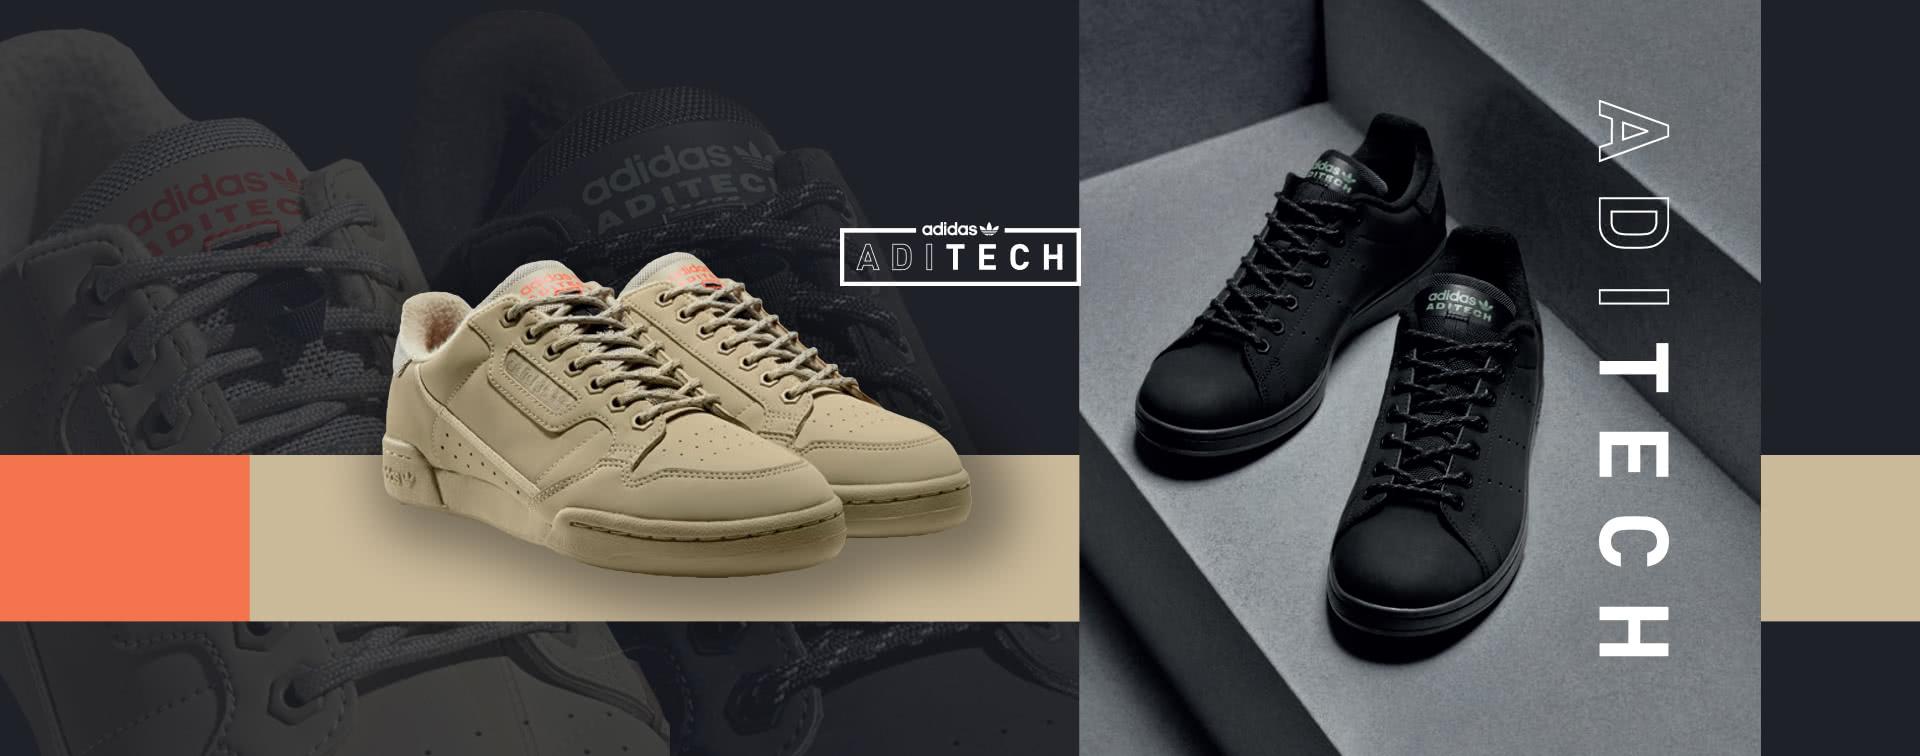 Adidas Aditech